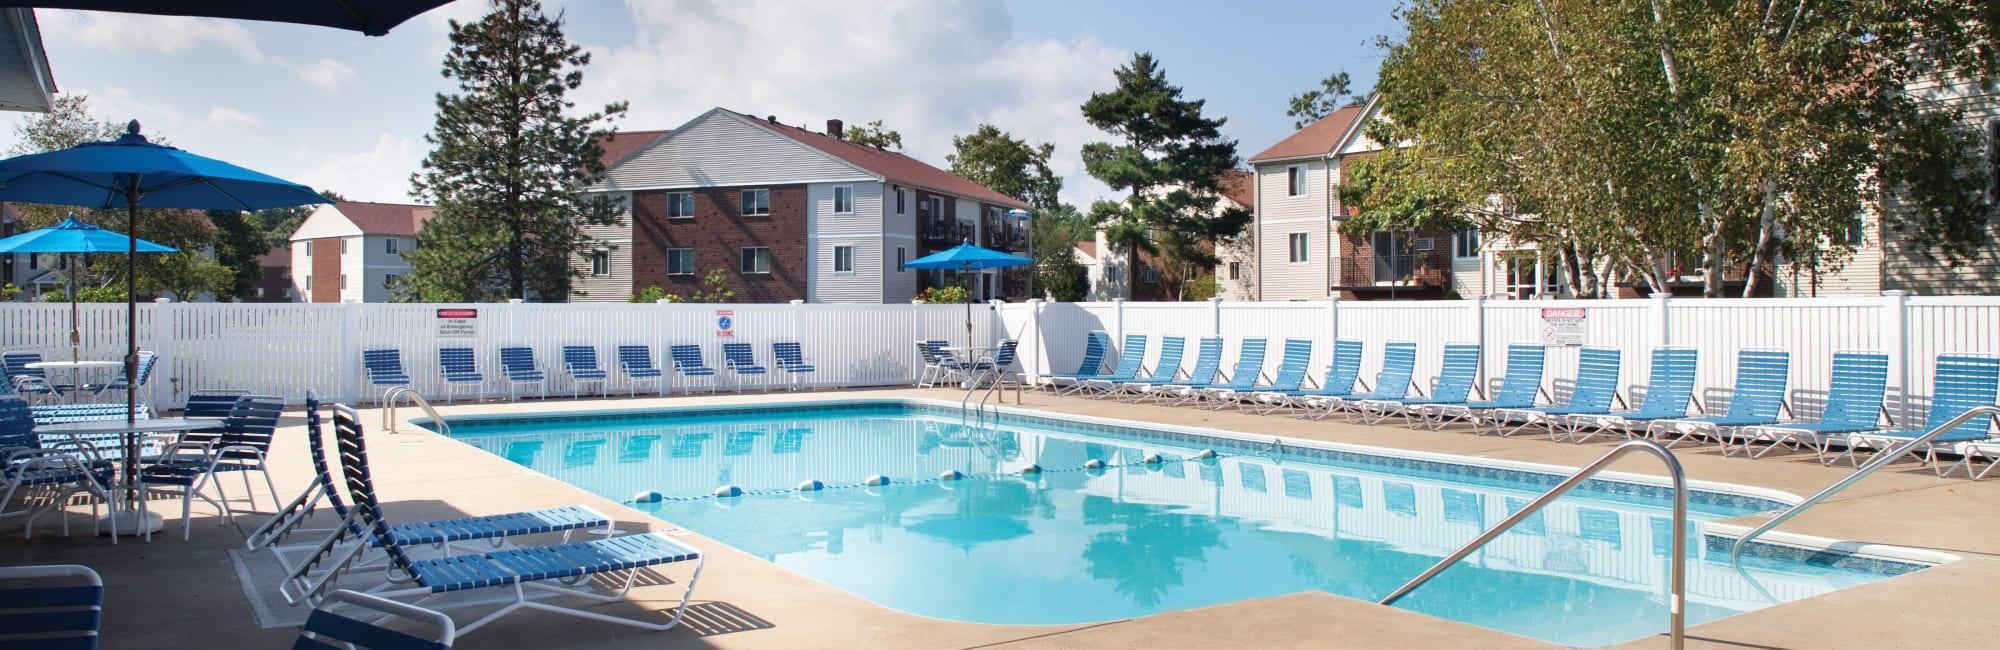 Apartments at The Village at Marshfield in Marshfield, Massachusetts